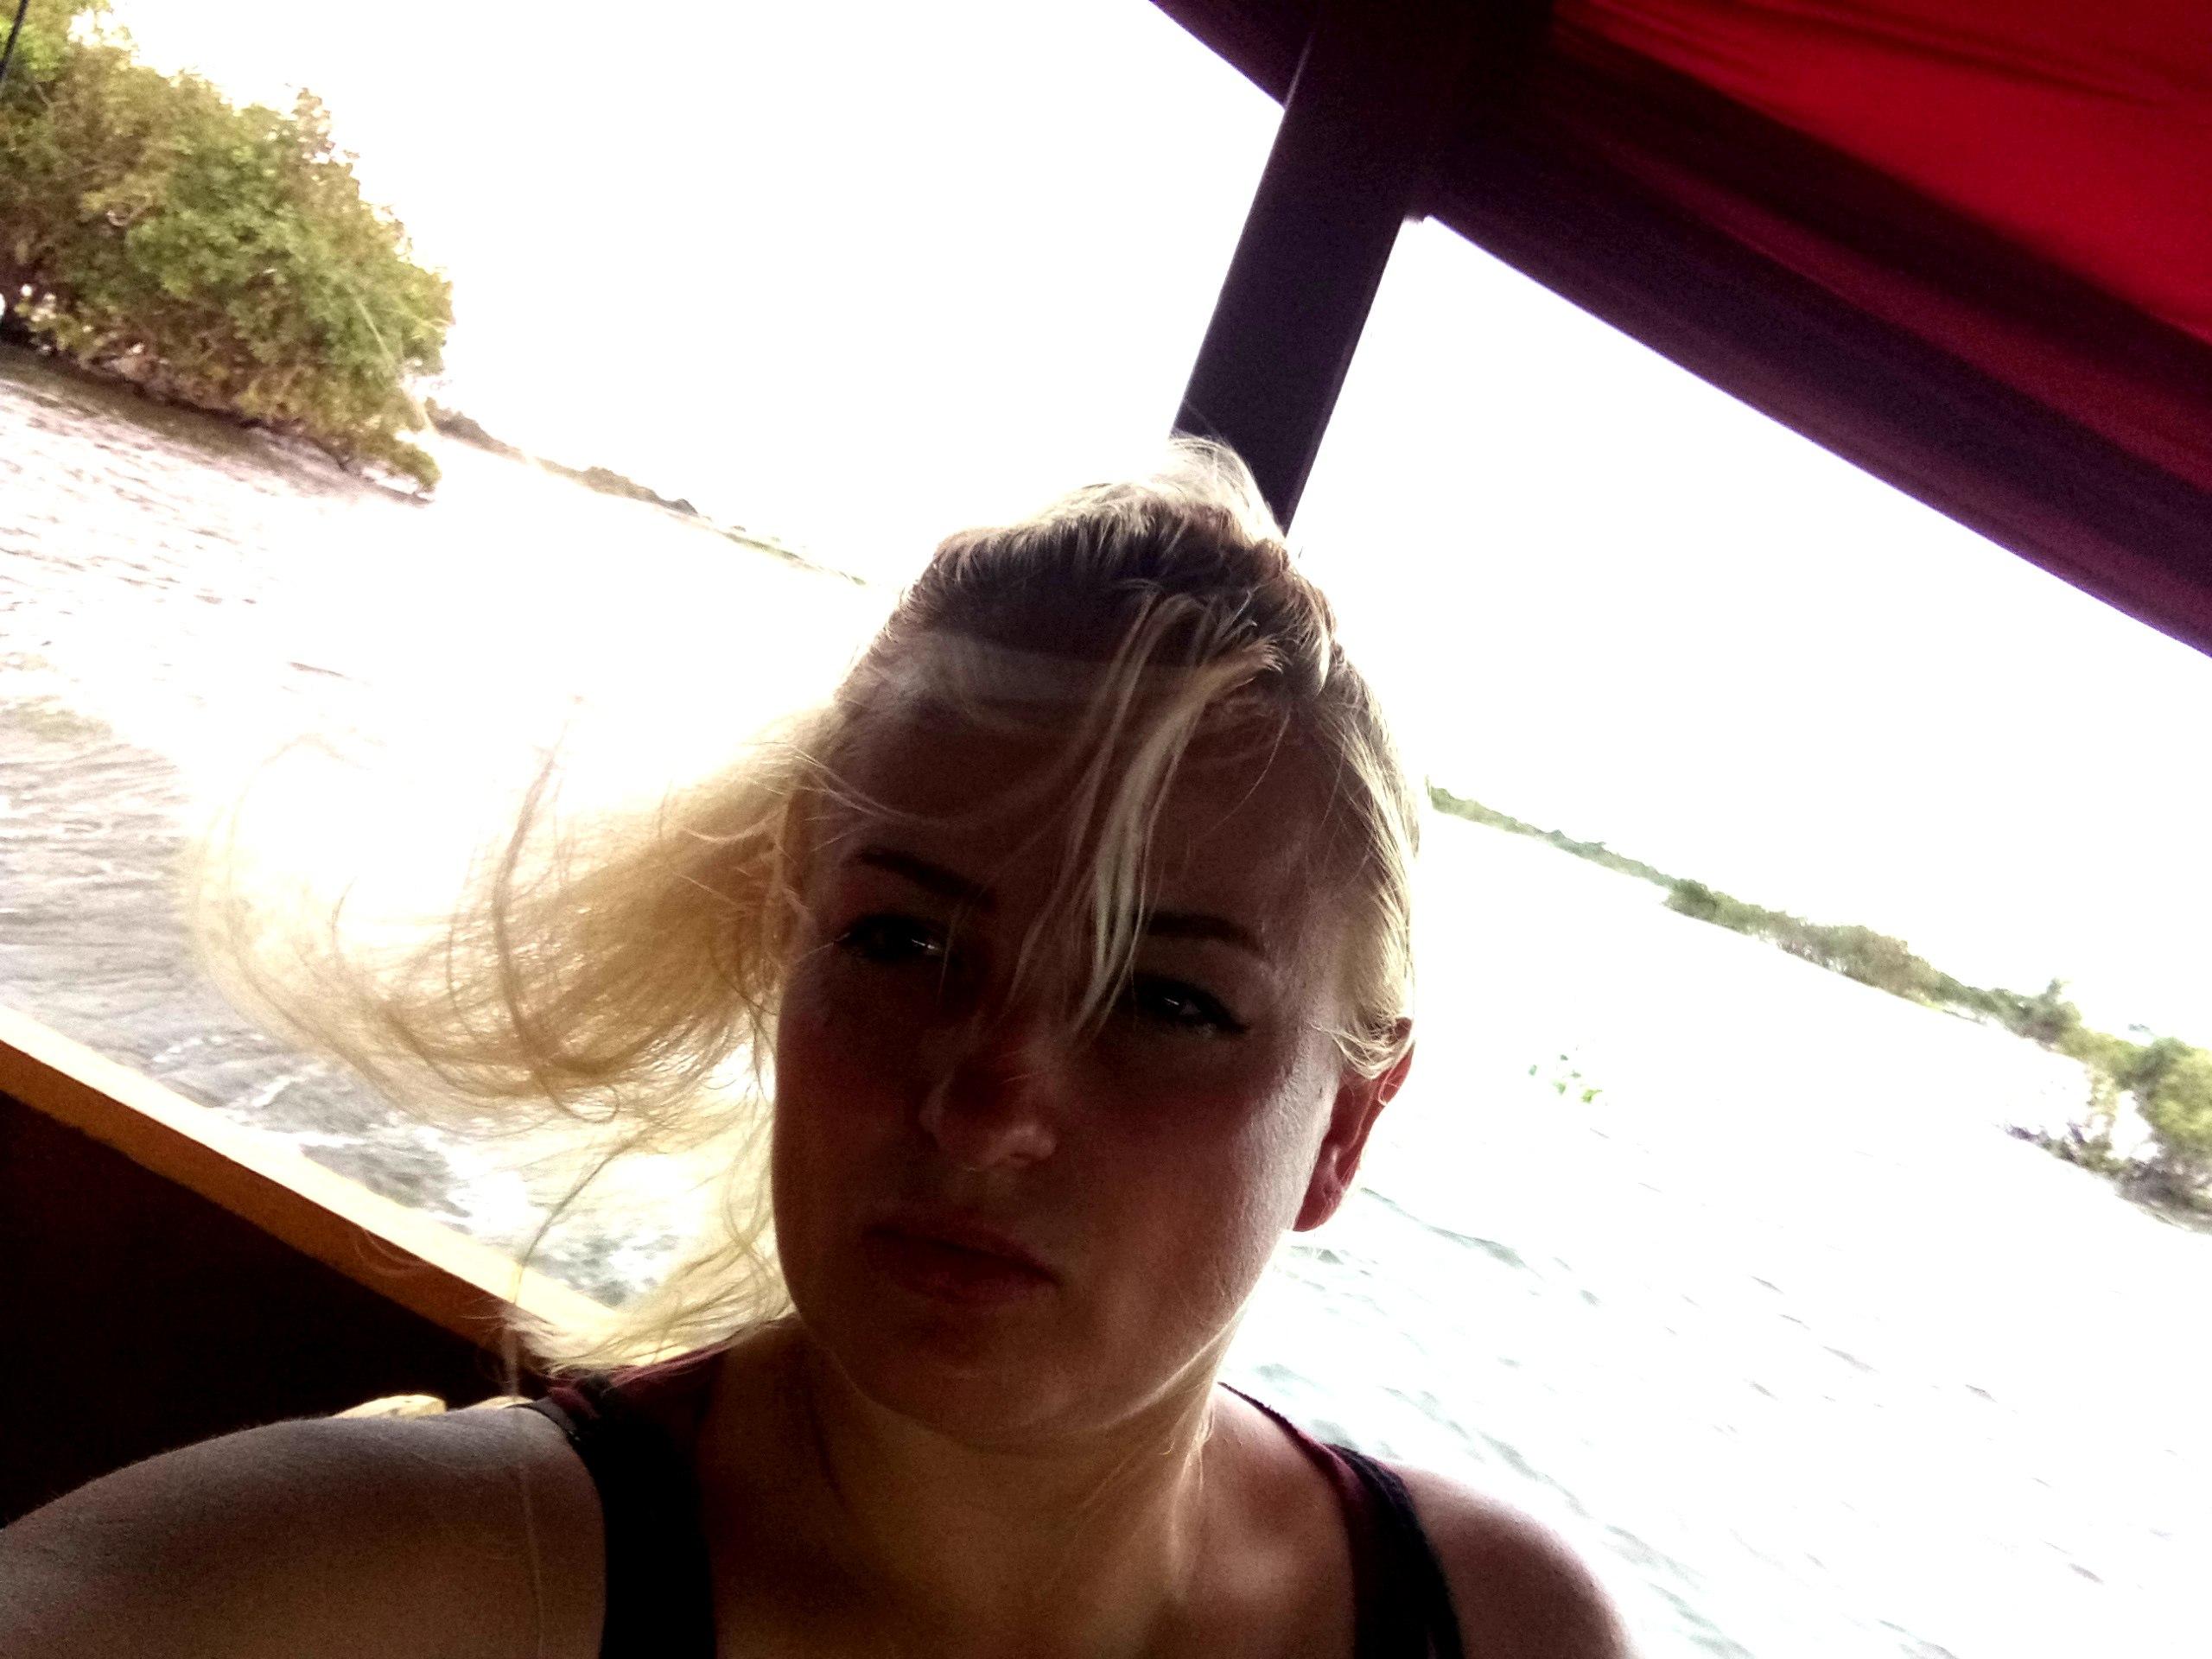 пляж - Елена Руденко. Мои путешествия (фото/видео) - Страница 3 ILBPu3DJK4k